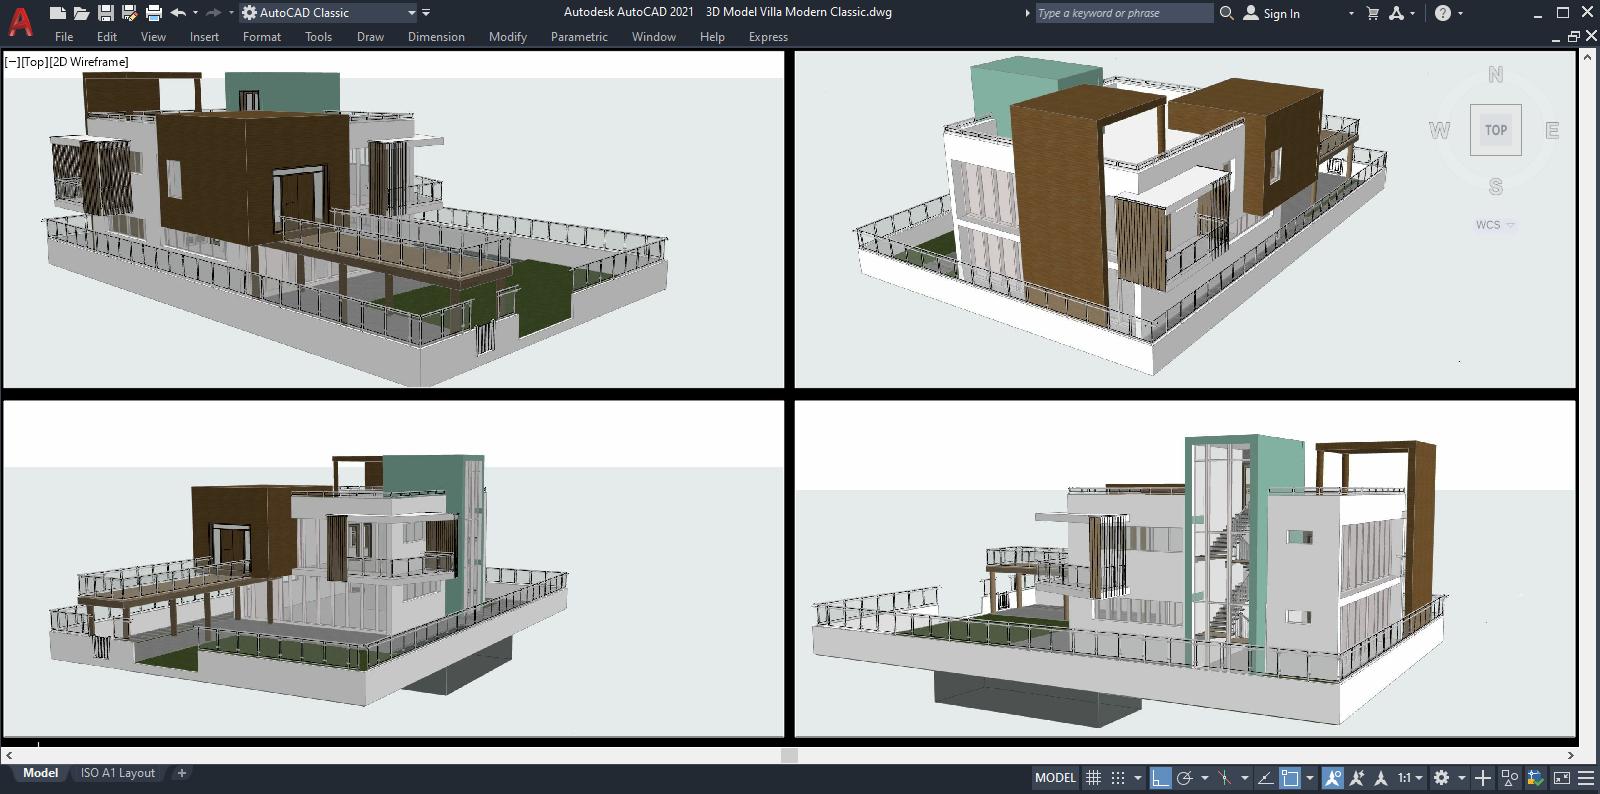 3D Model Villa Modern Classic